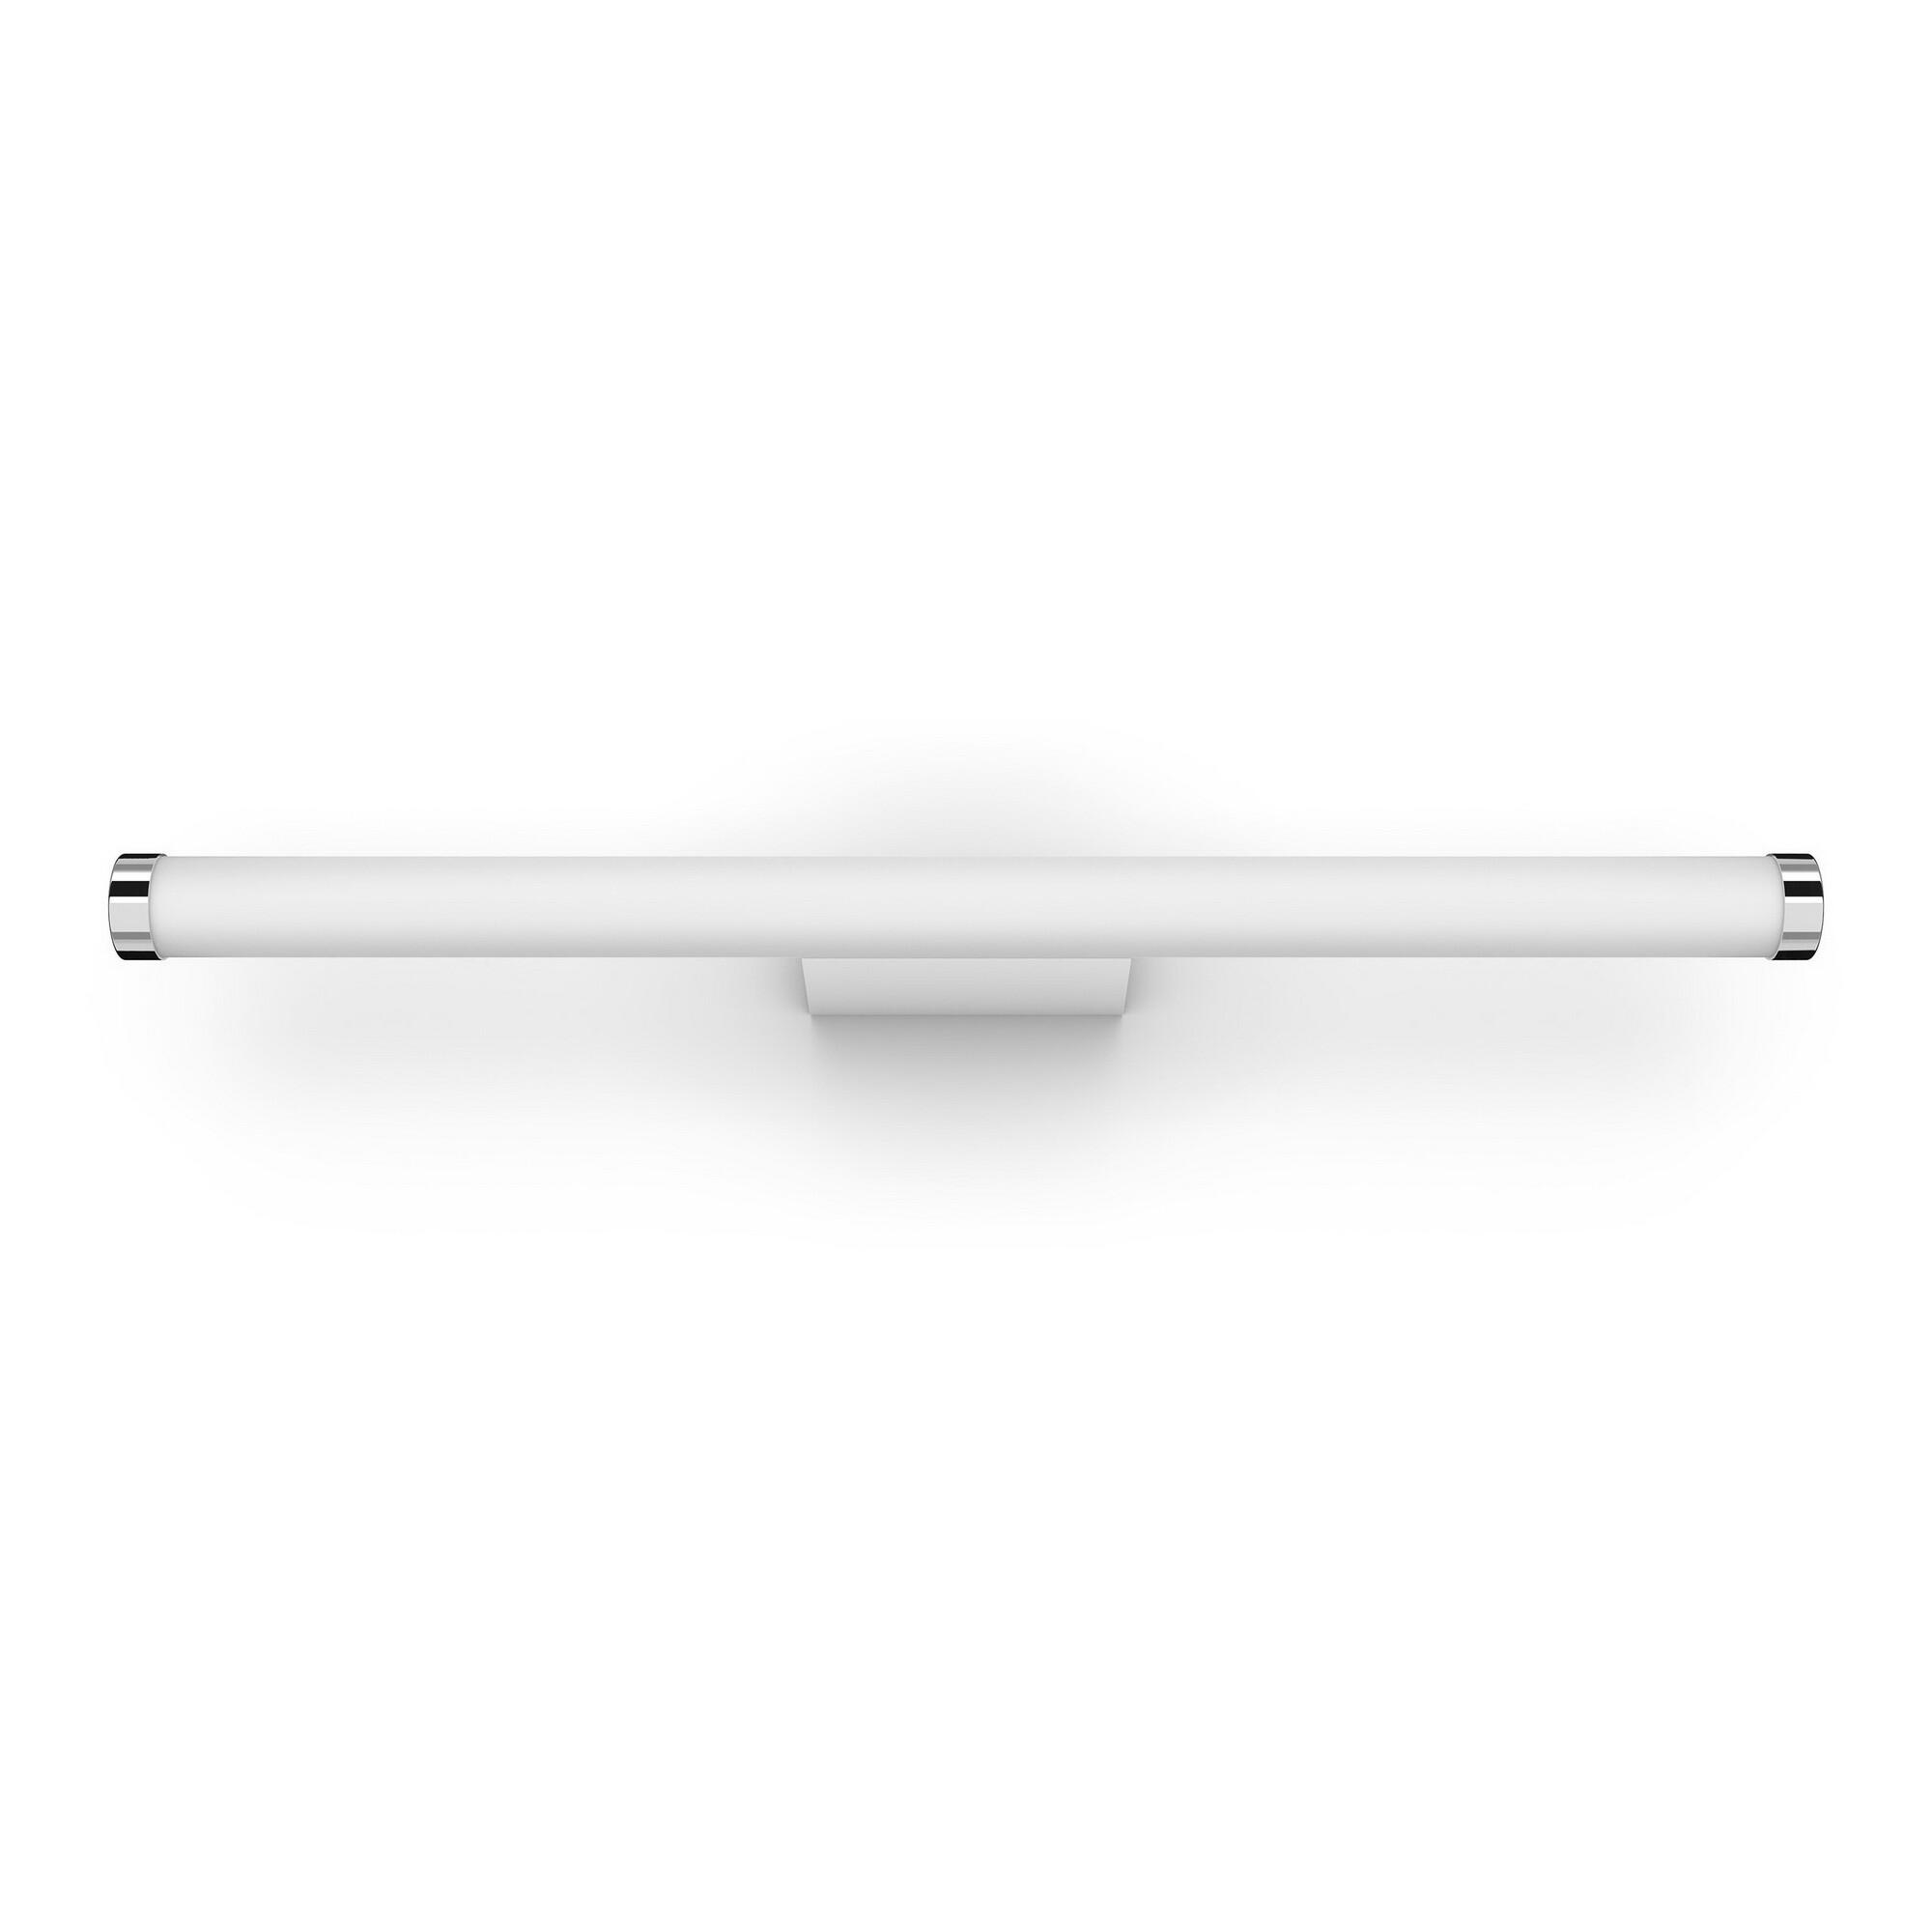 Philips HUE ADORE Applique LED 1x20W/1750lm Blanc